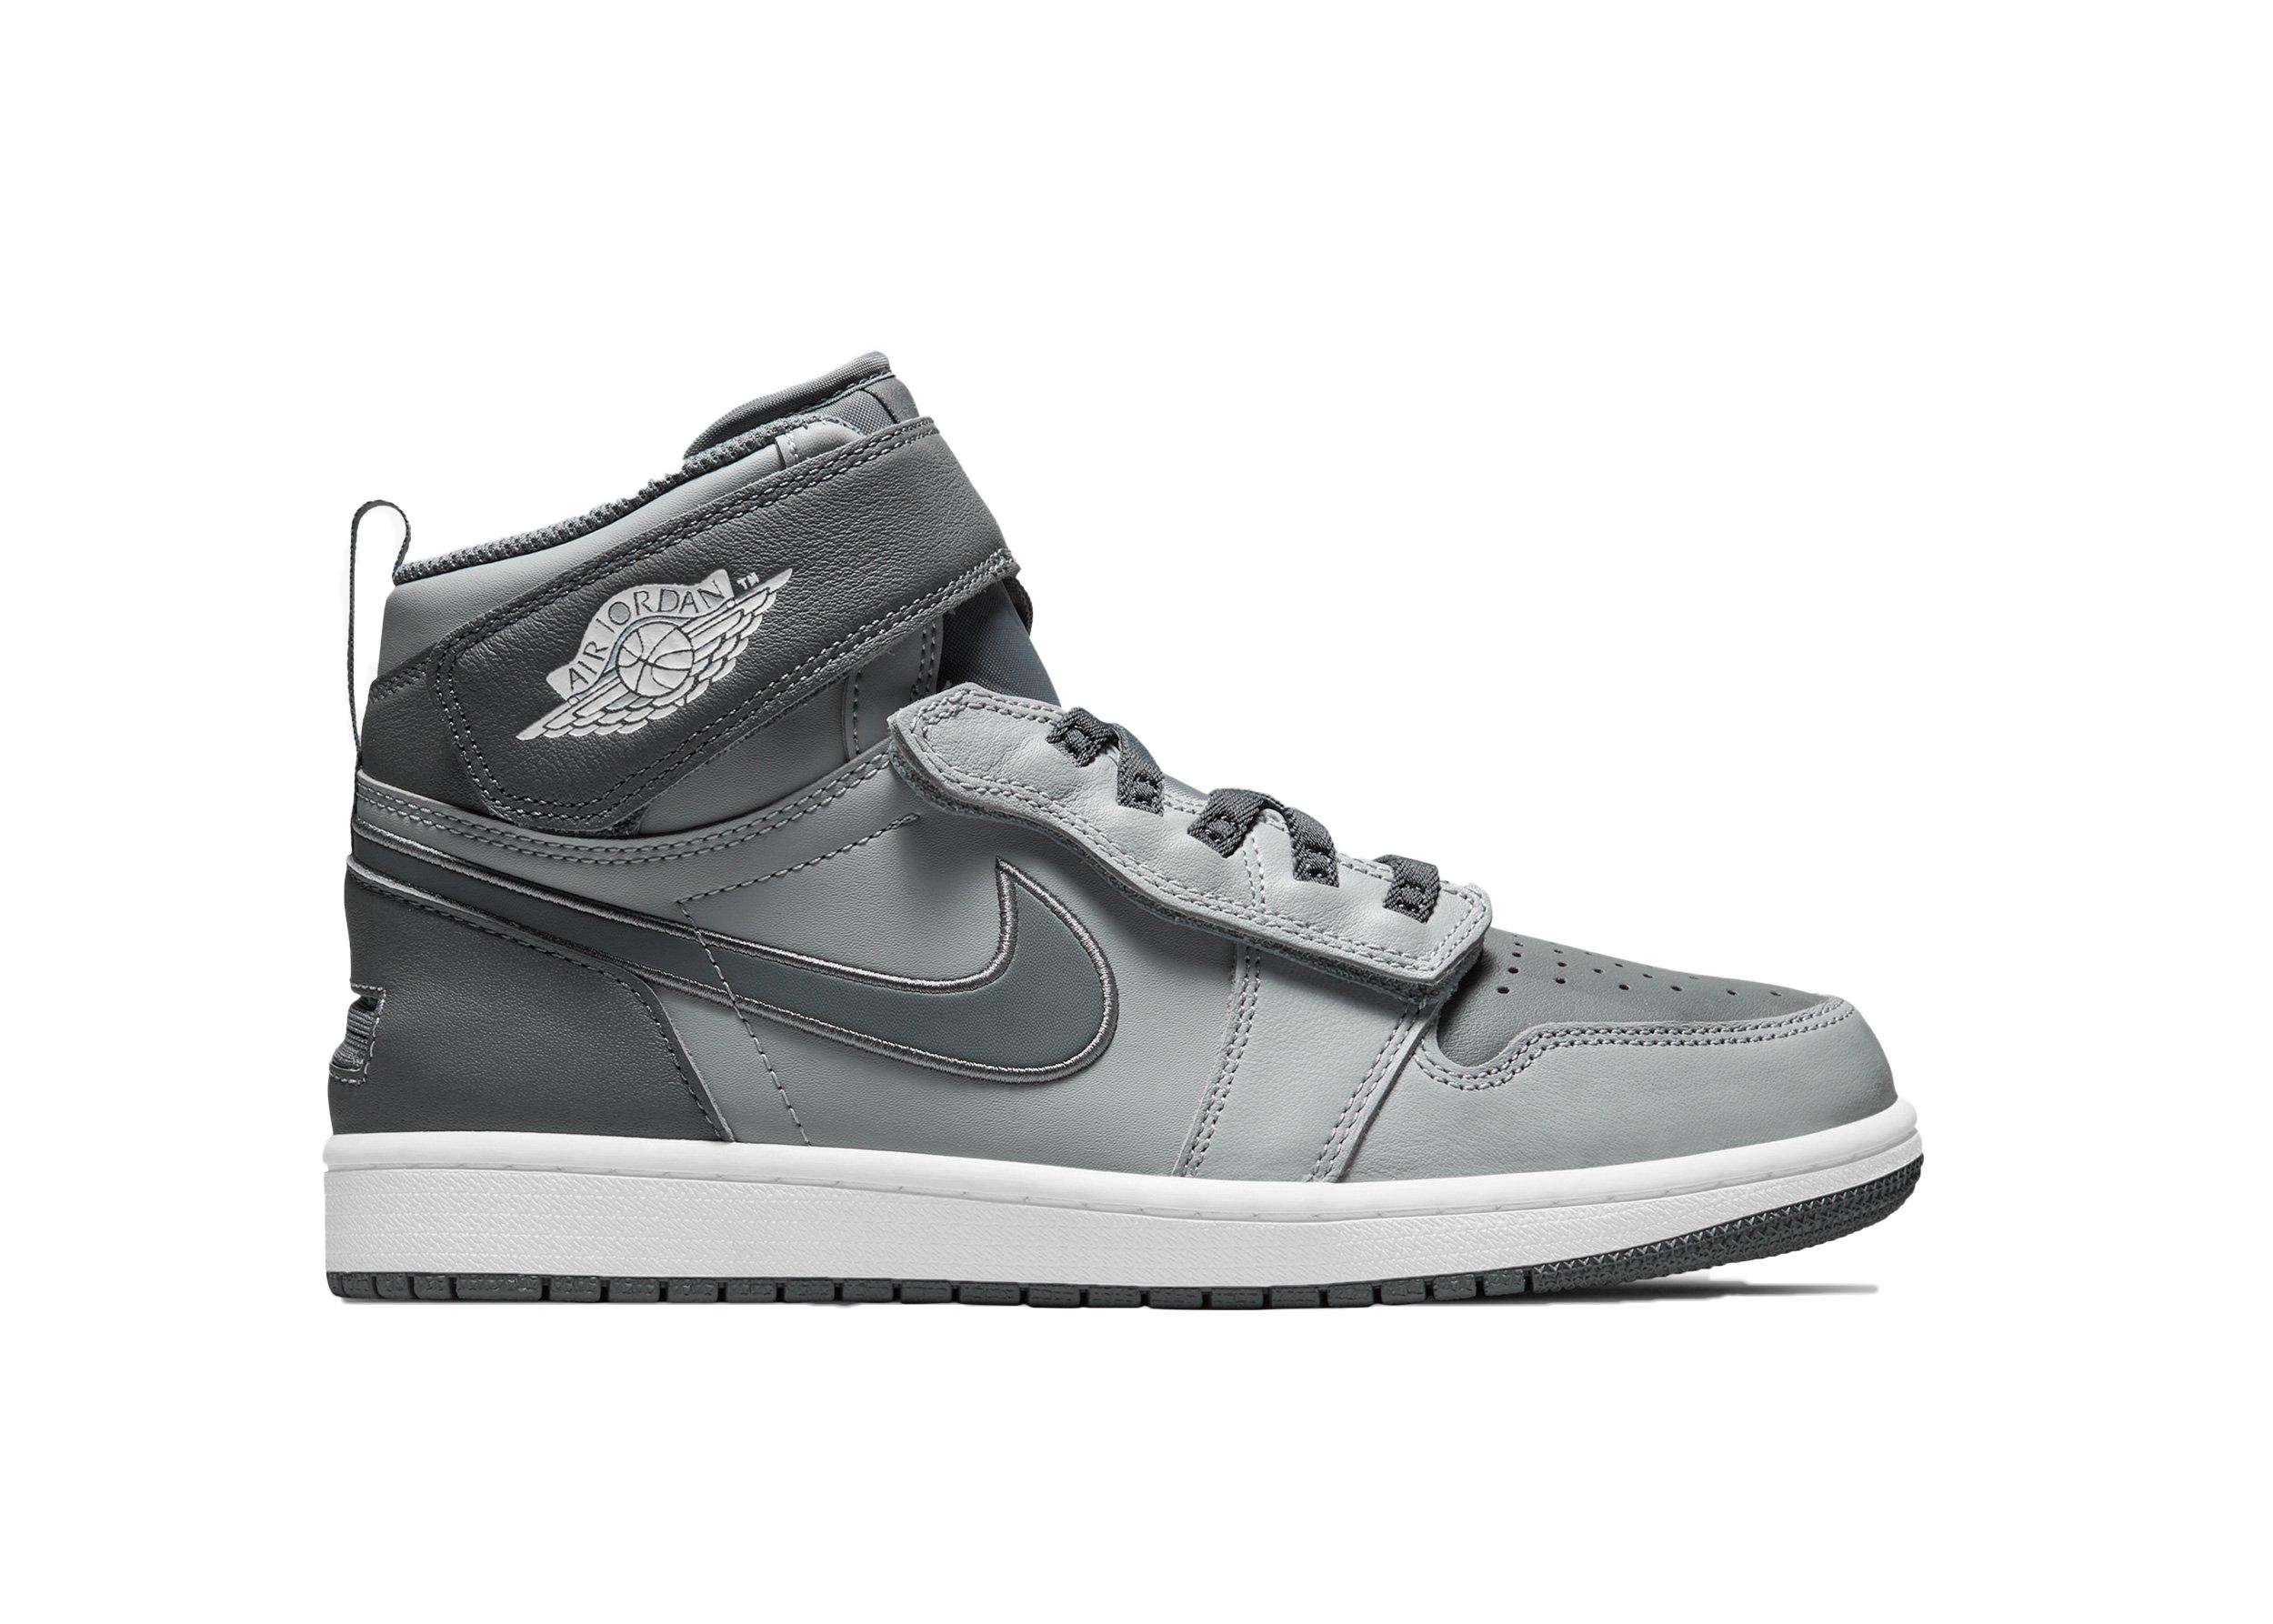 Jordan 1 High FlyEase Light Smoke Grey